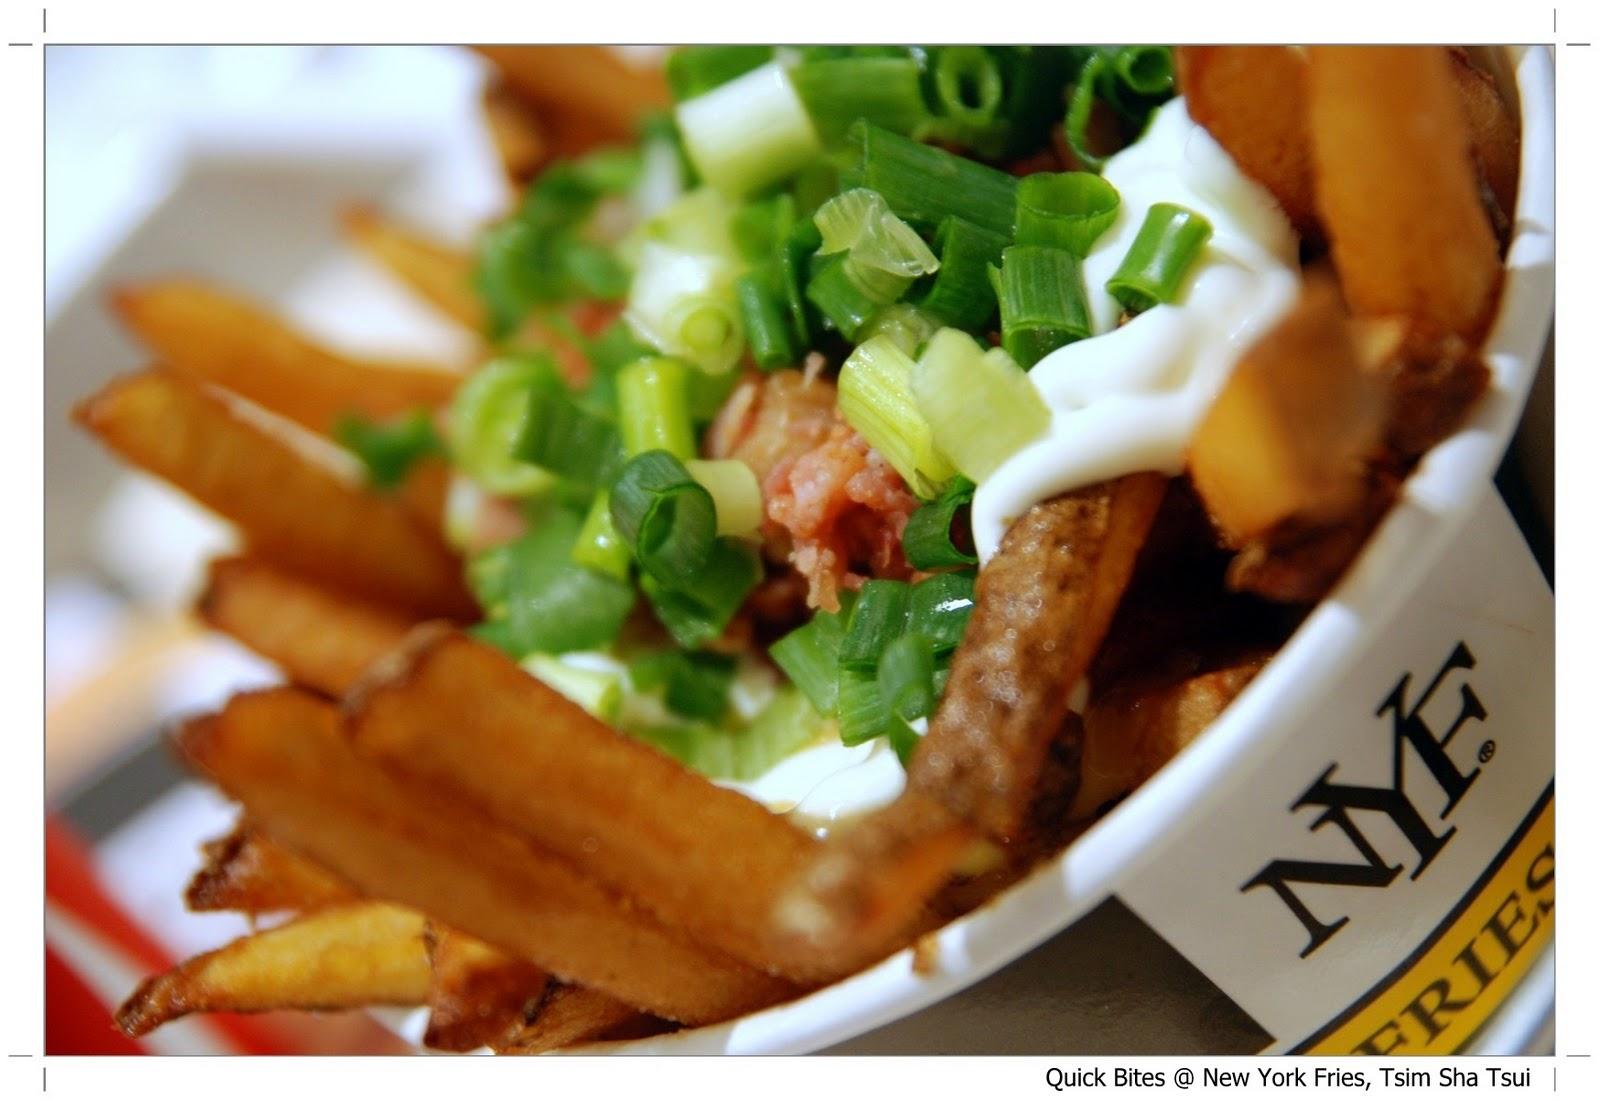 macau restaurant directory quick bites york fries